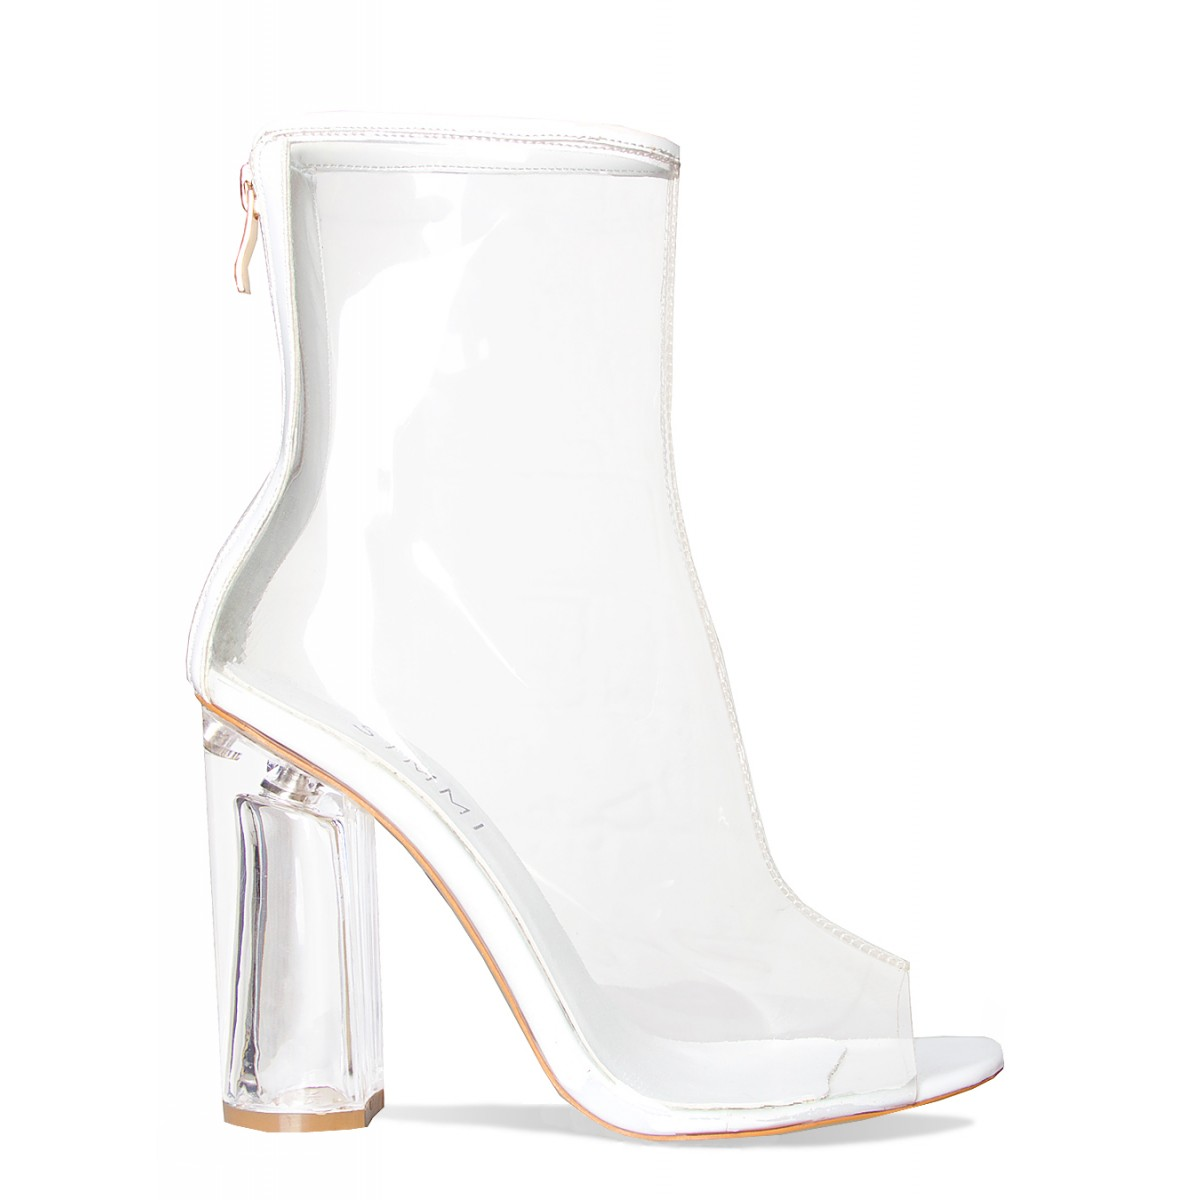 5f73076e54a Melissa White Peep Toe Perspex Heel Ankle Boots   Simmi Shoes